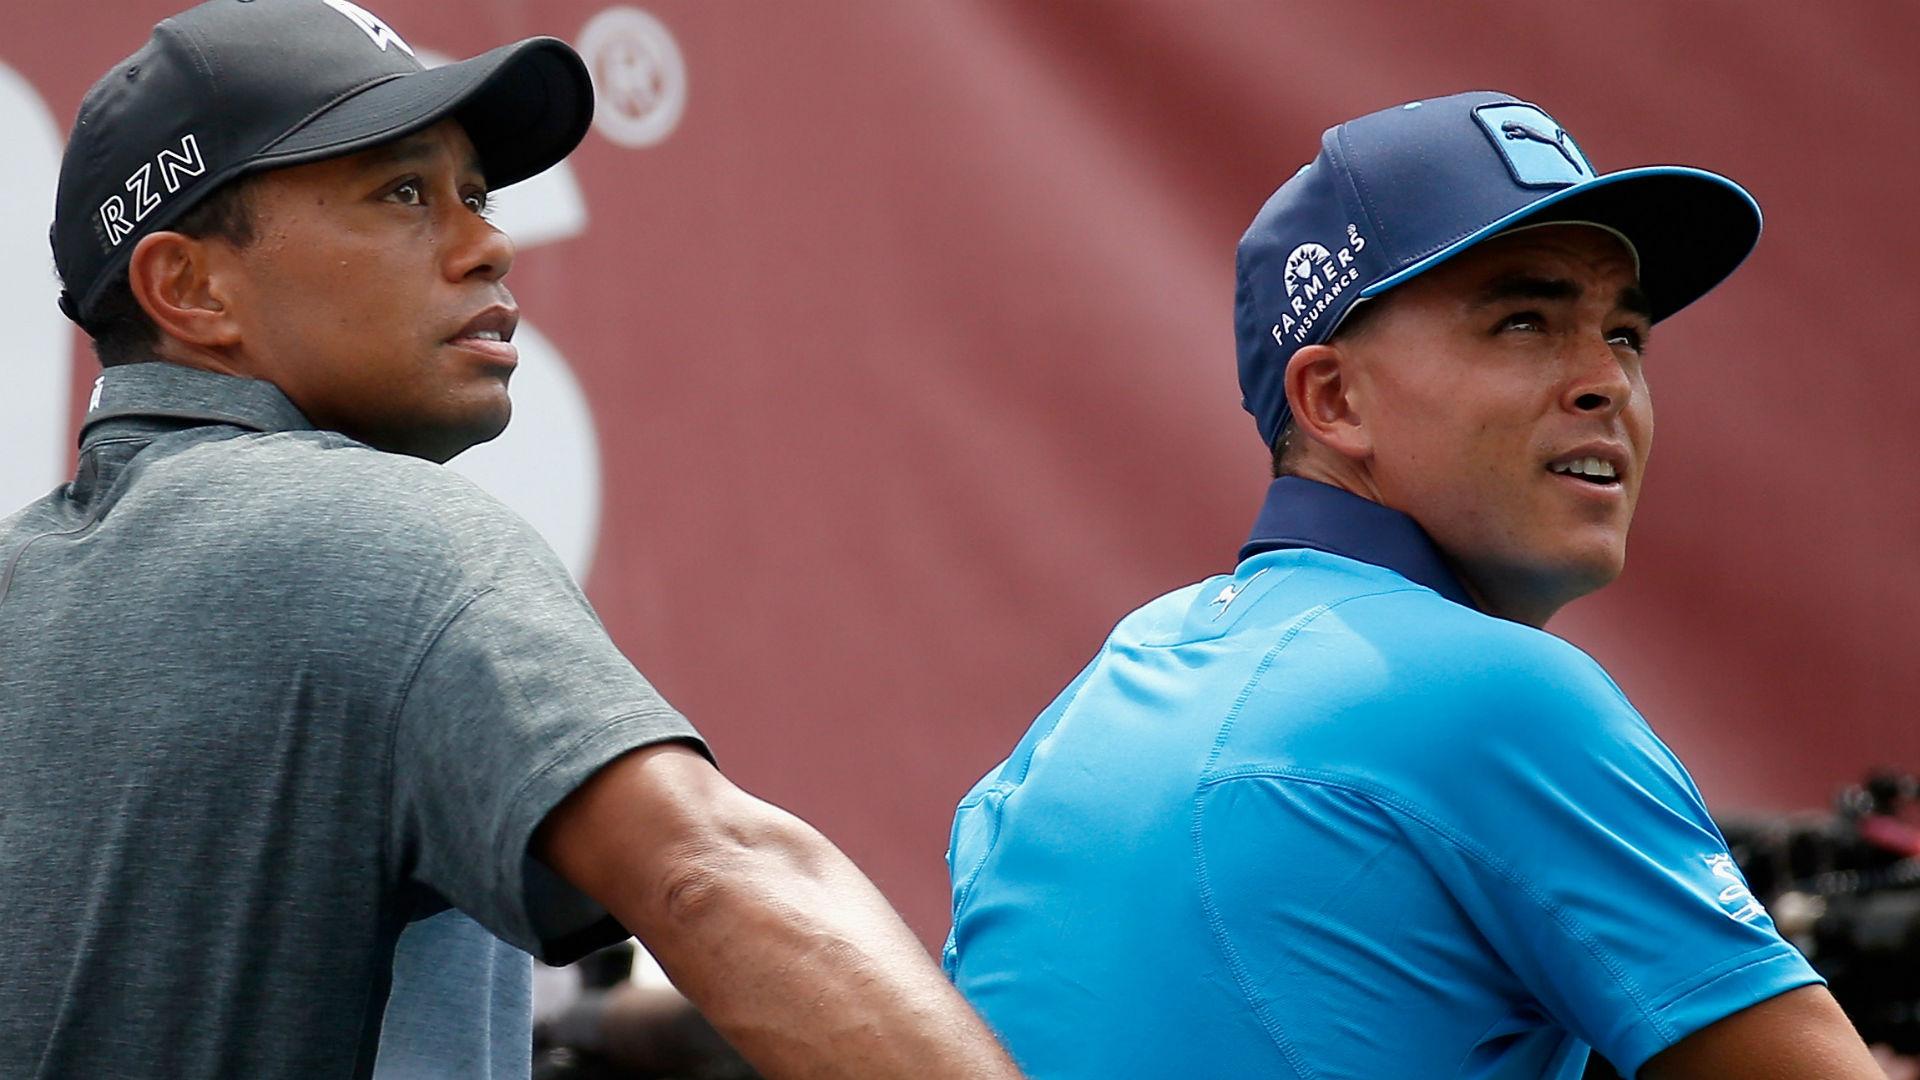 Rickie Fowler confirms Tiger Woods crushing golf ball